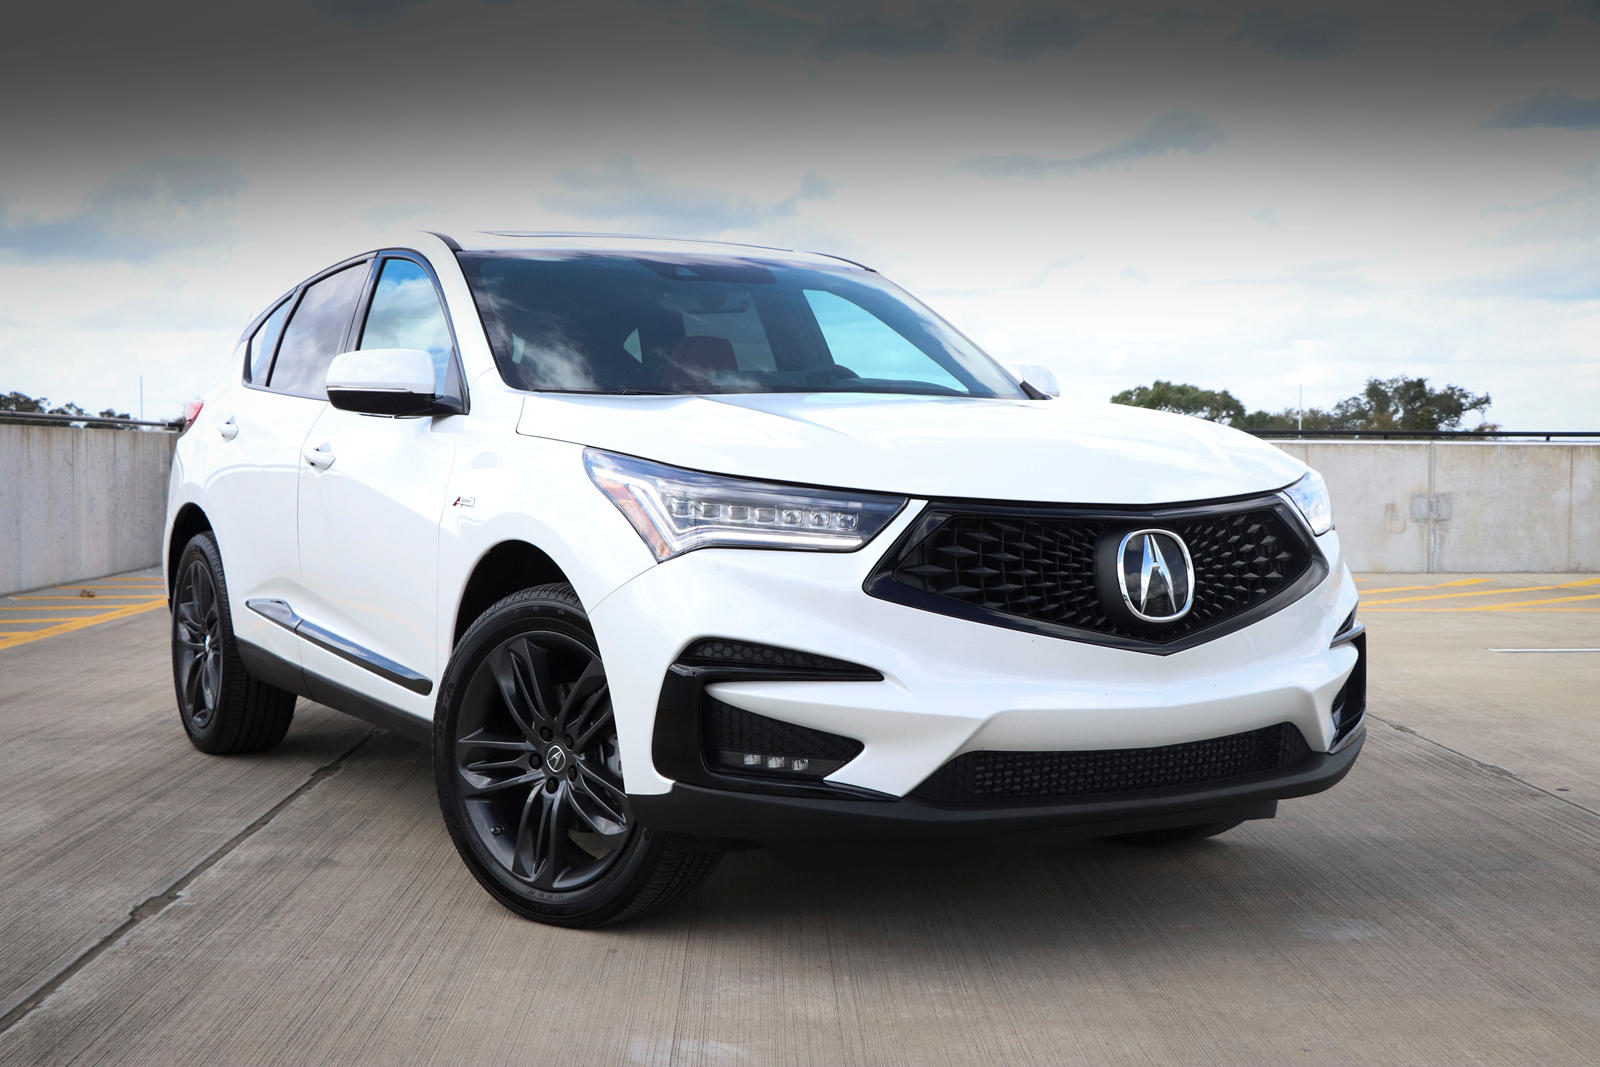 2020 Acura RDX: Review, Trims, Specs, Price, New Interior ...